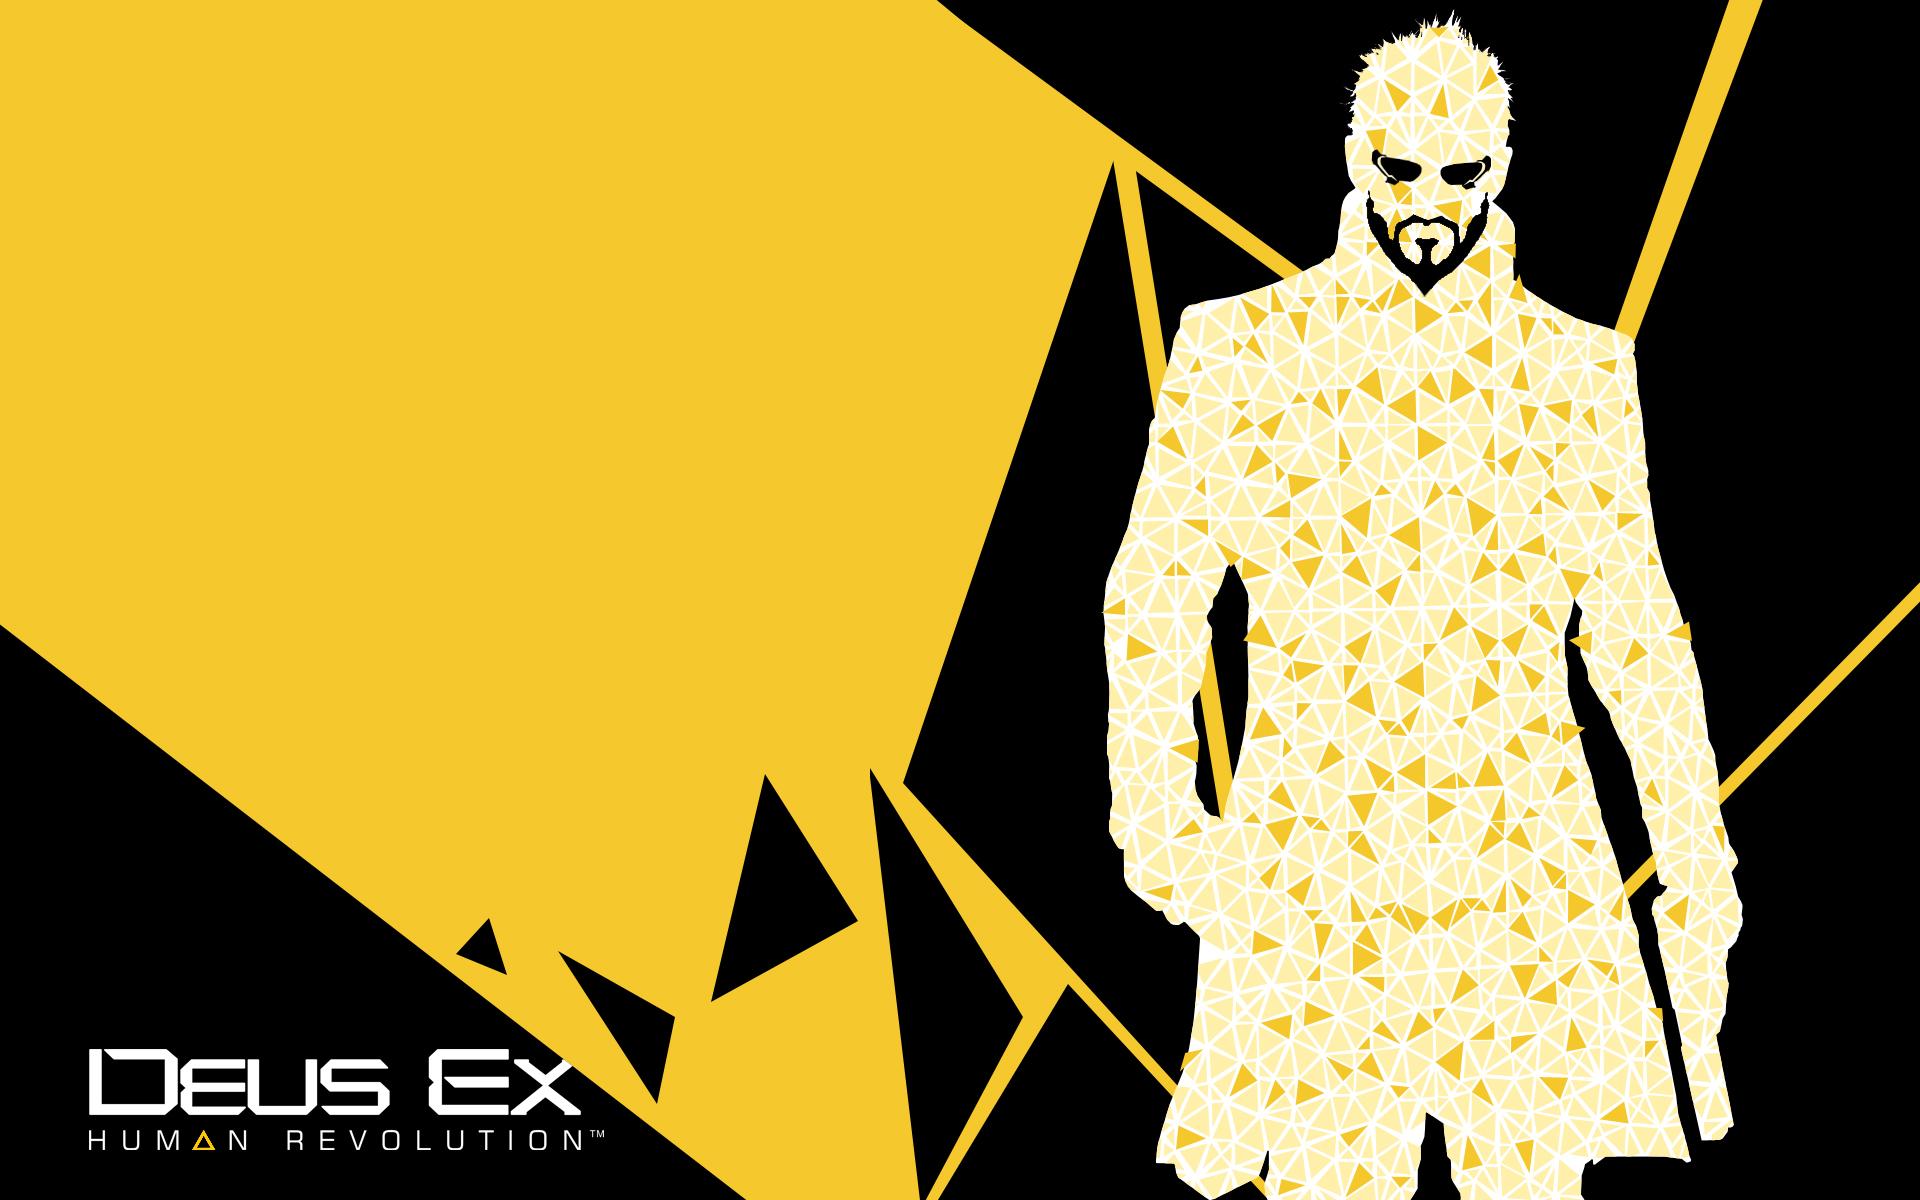 Deus Ex Human Revolution Wallpaper Triangular